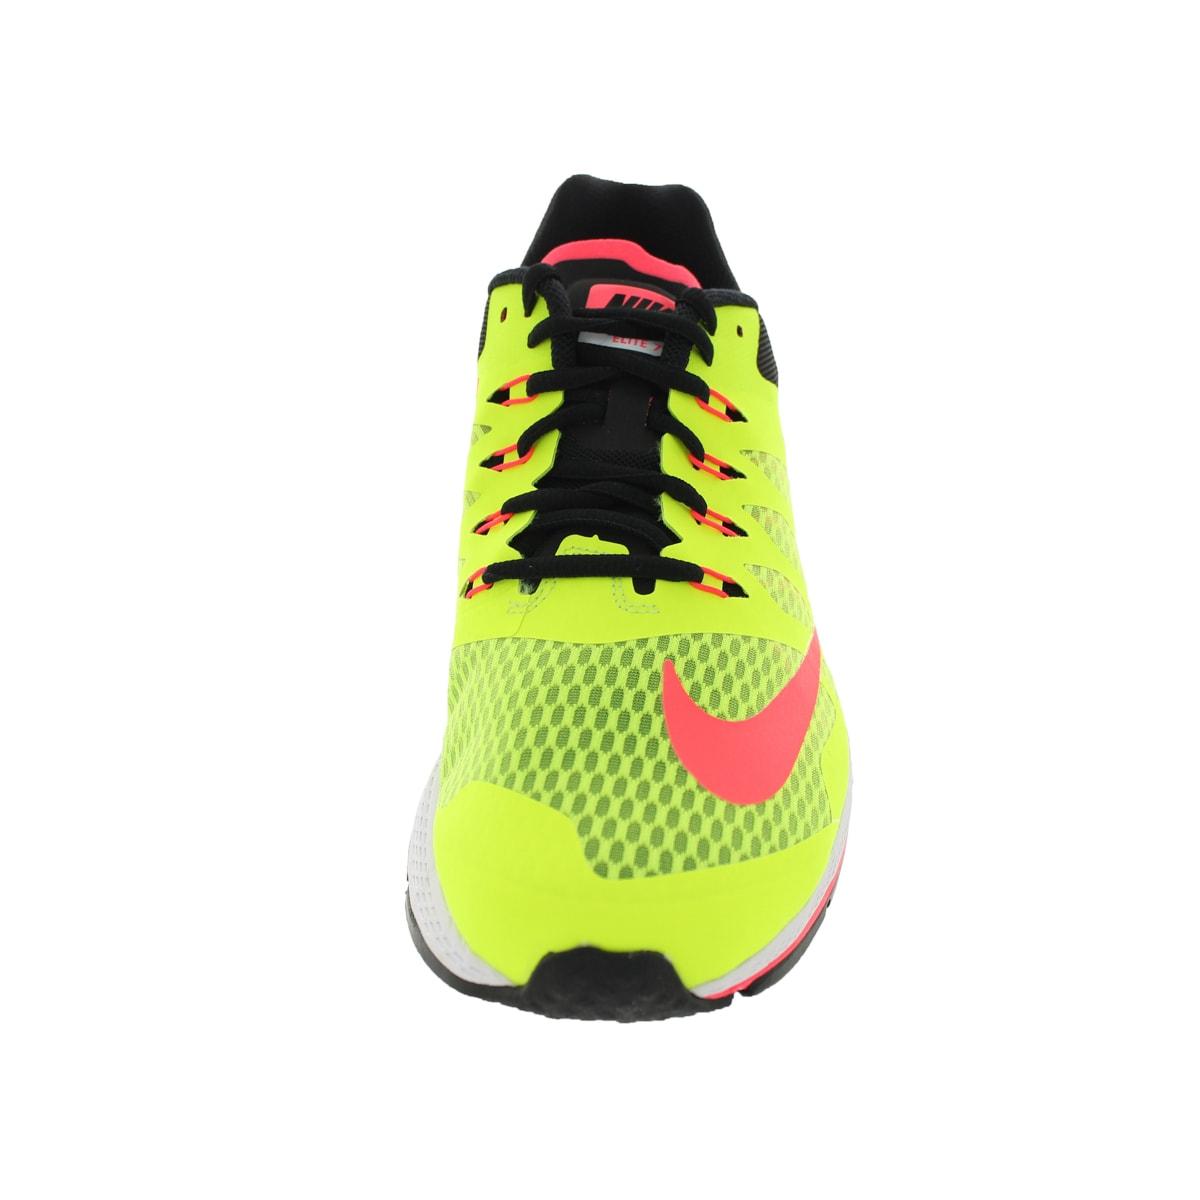 45032b14ecd Shop Nike Men s Zoom Elite 7 Volt Hyper Punch Black Running Shoe - Free  Shipping Today - Overstock - 12321329